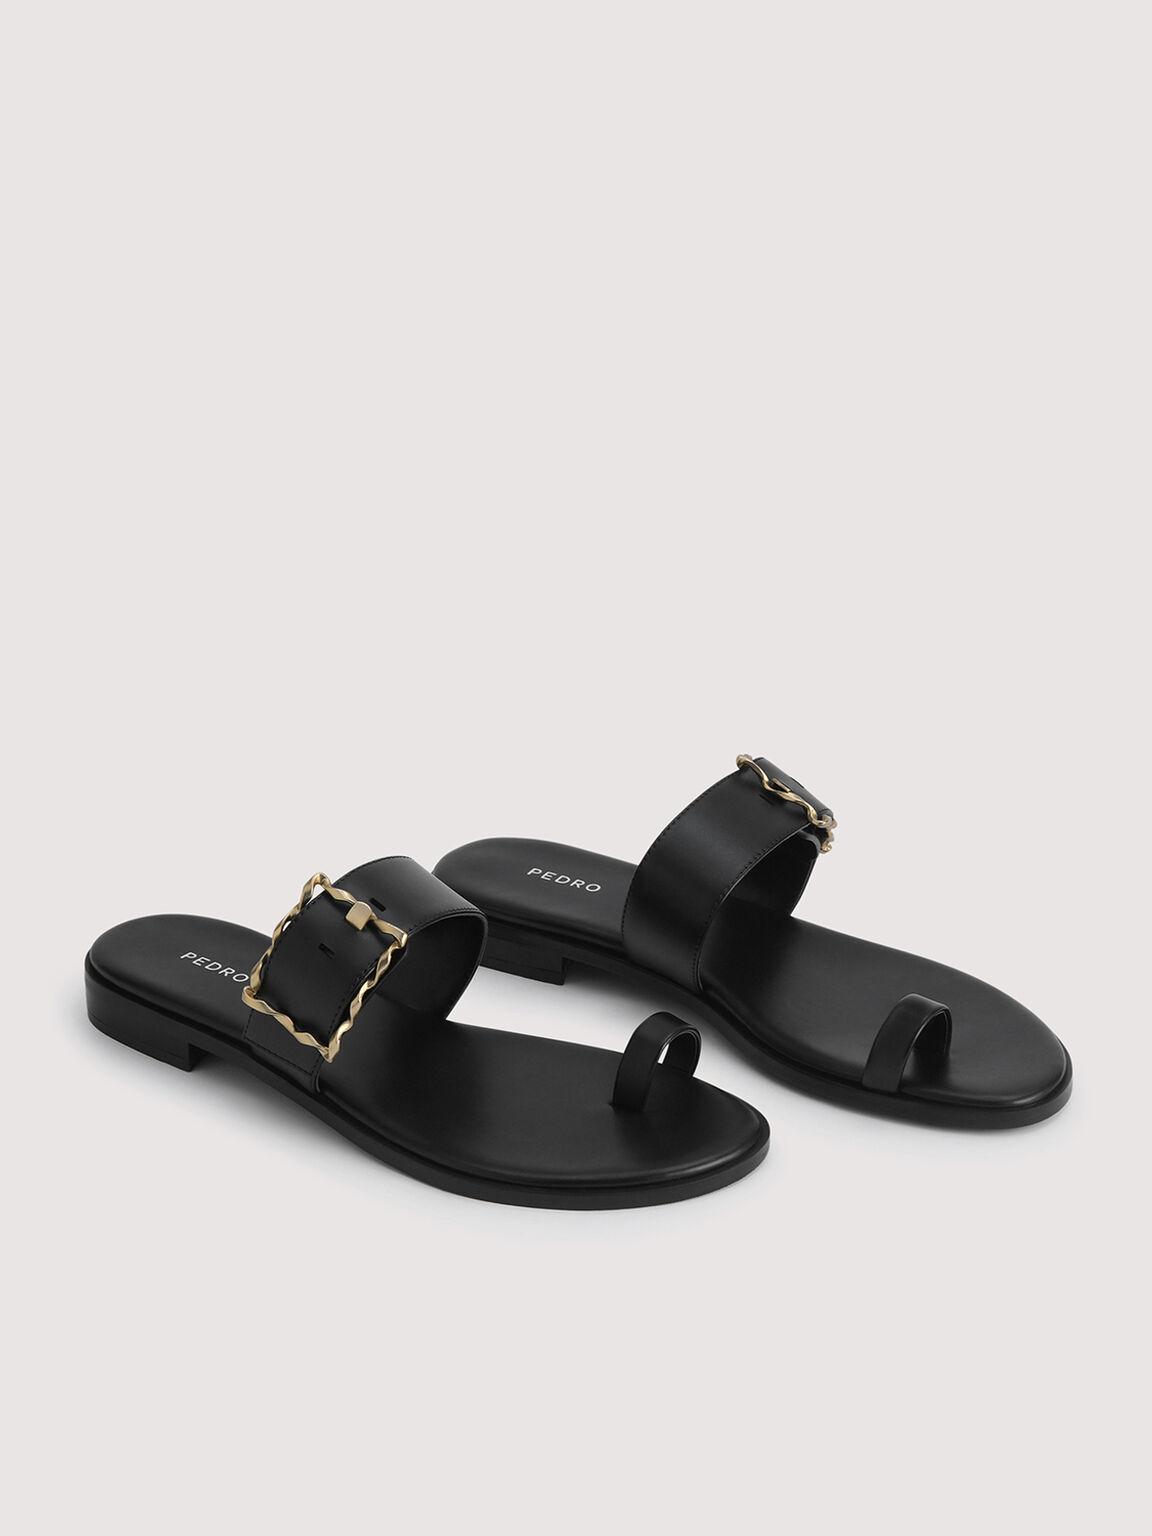 Toe Loop Sandals with Gold Buckle, Black, hi-res